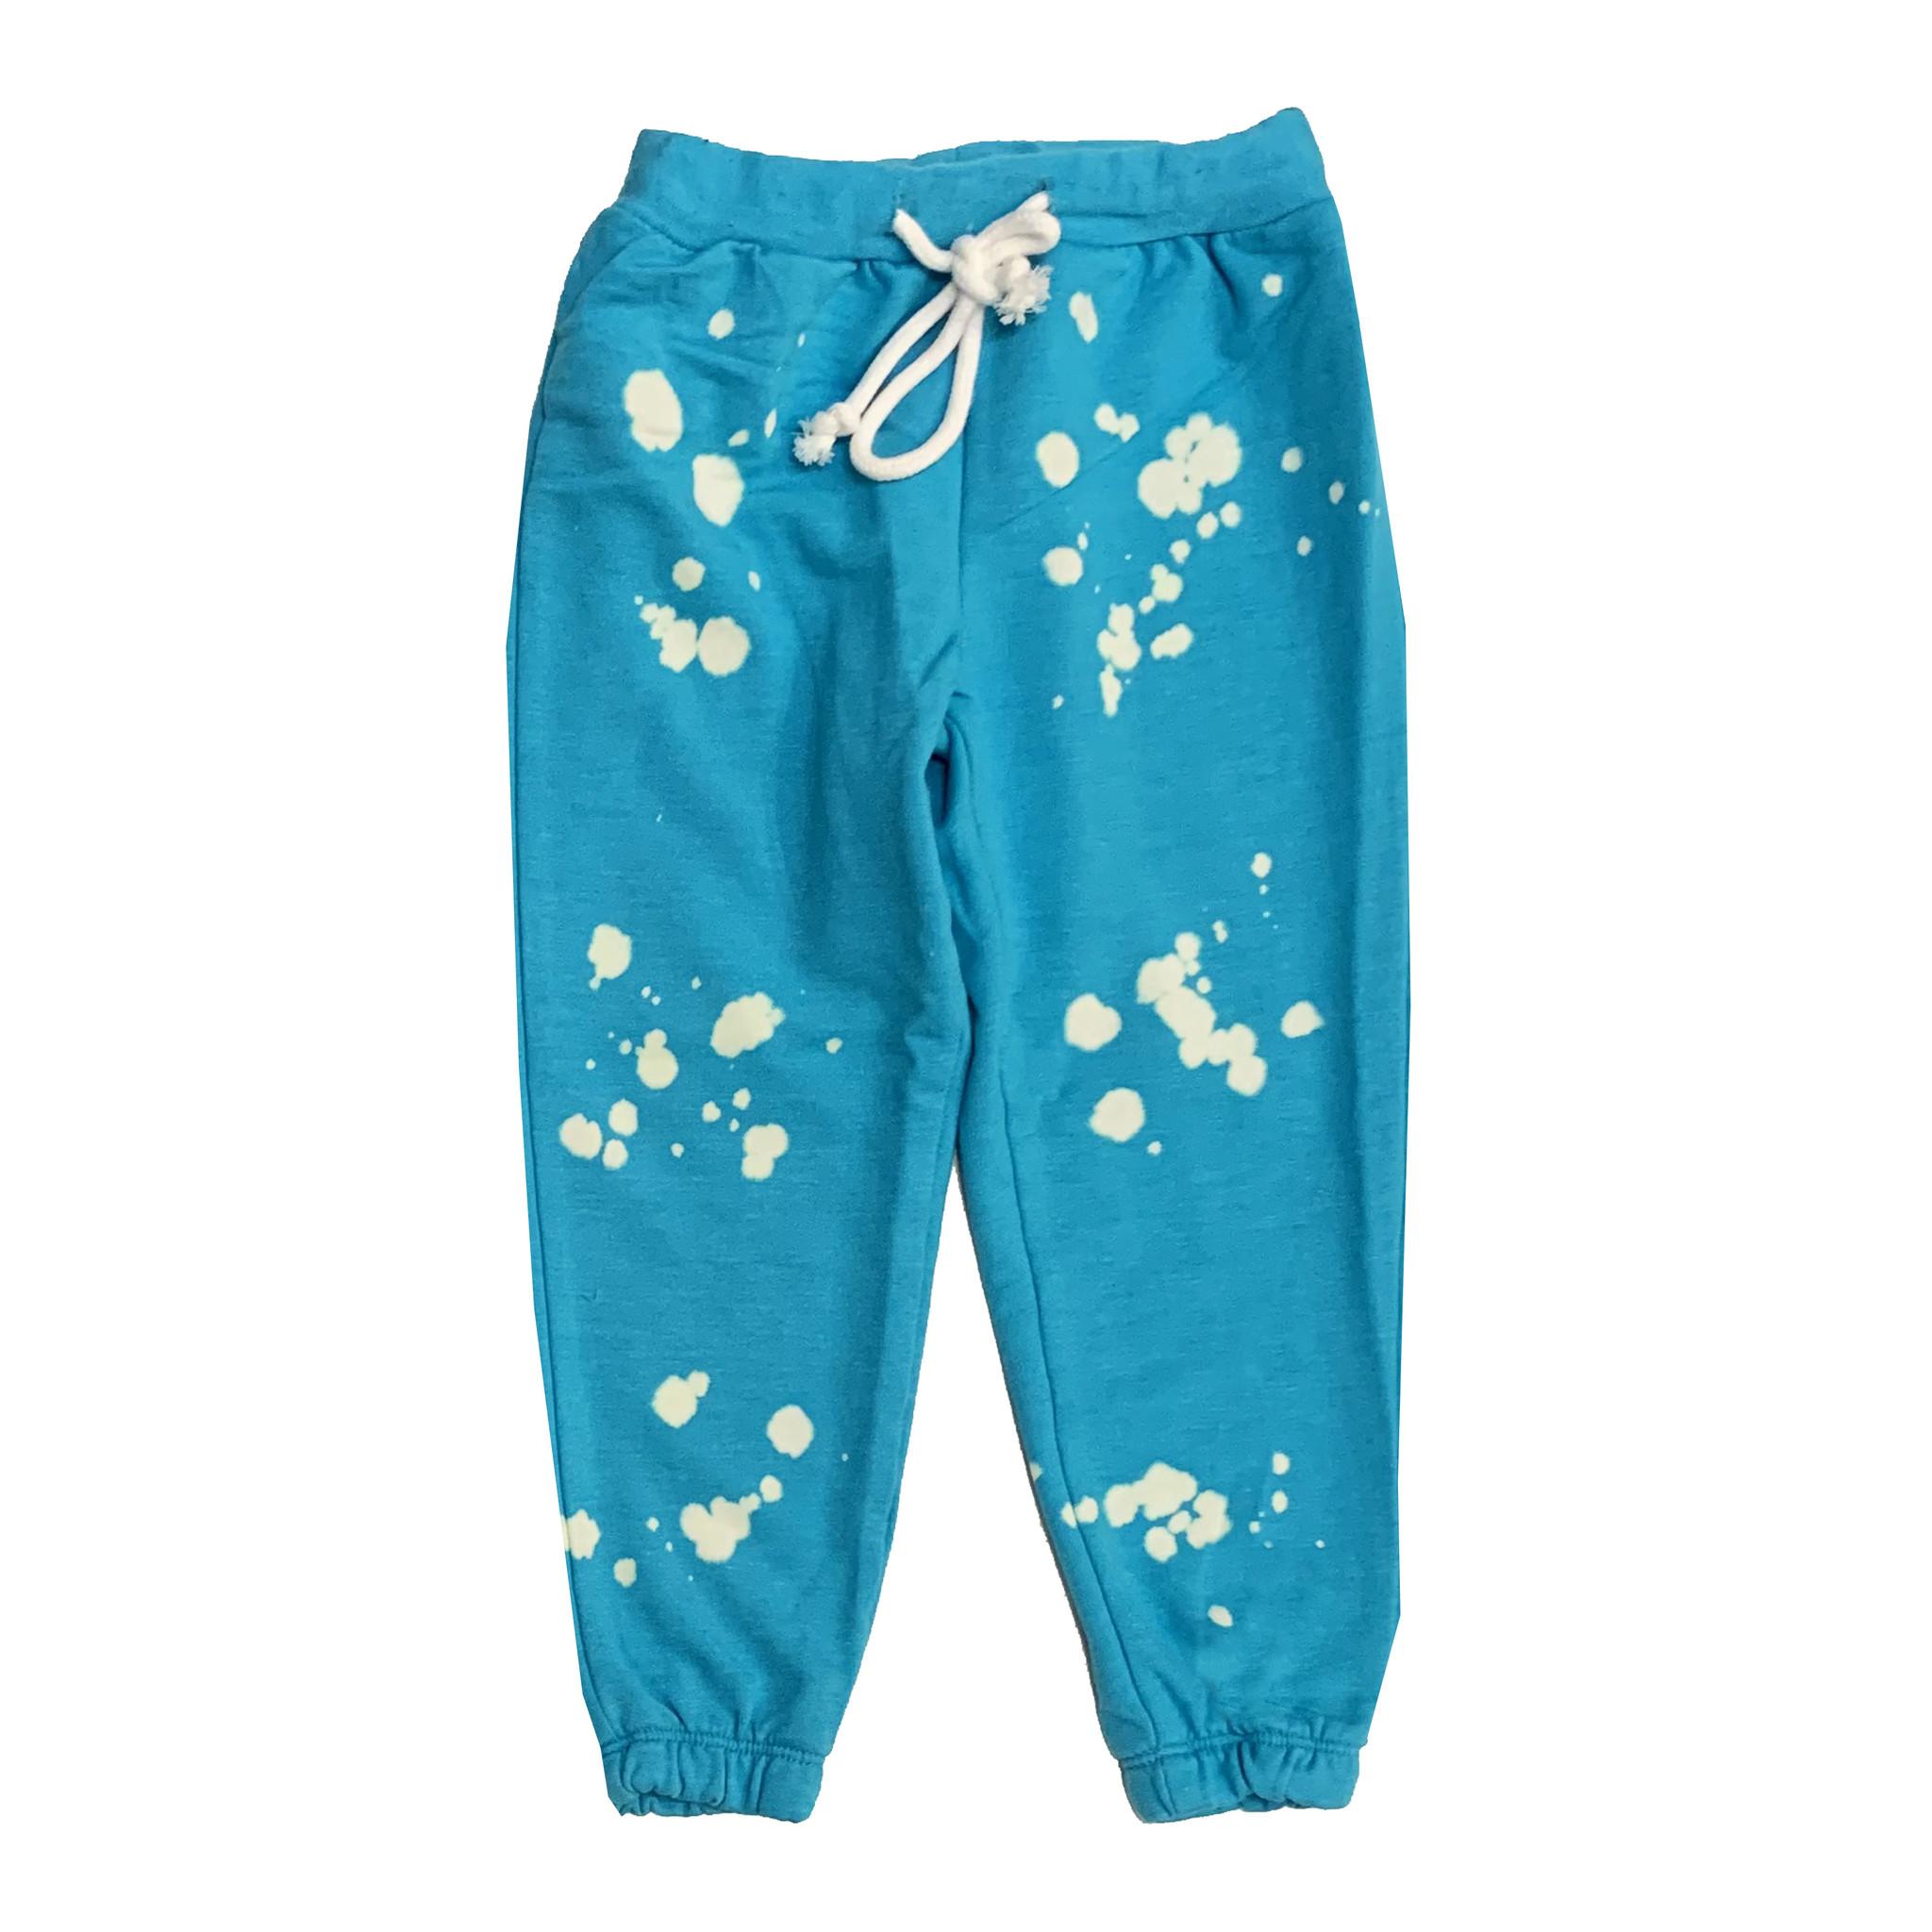 Katie J Turquoise Bleach Splatter Sweatpants